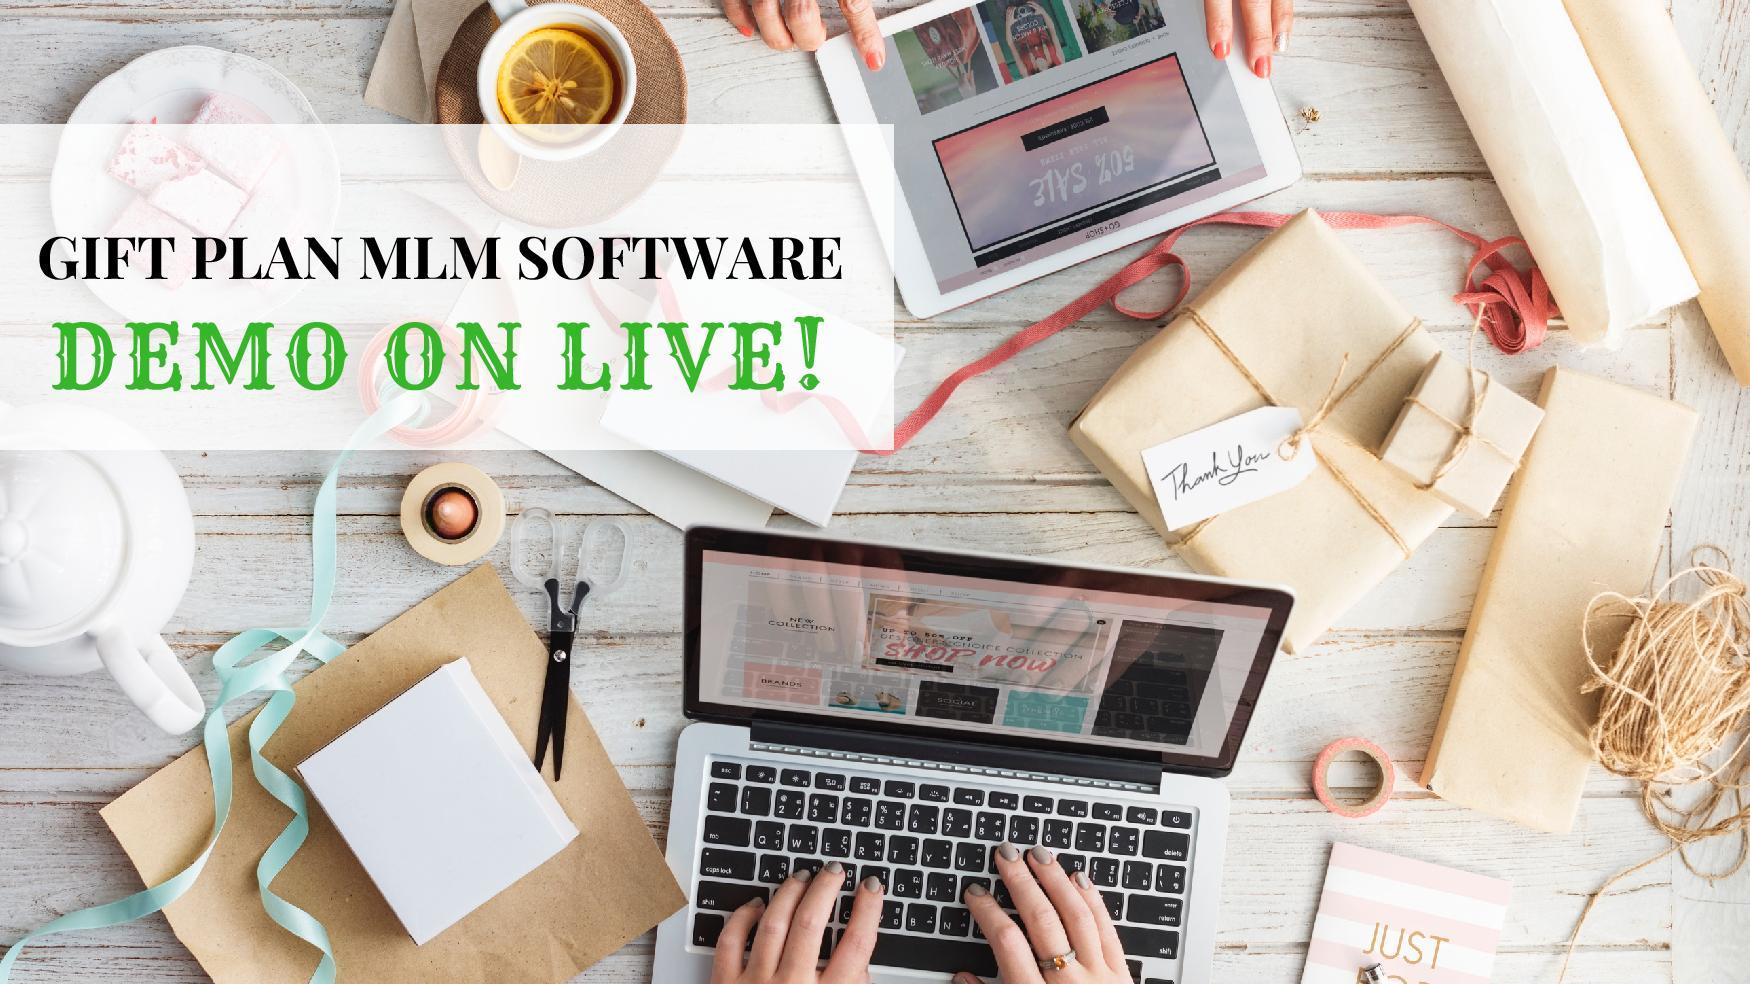 gift mlm plan software